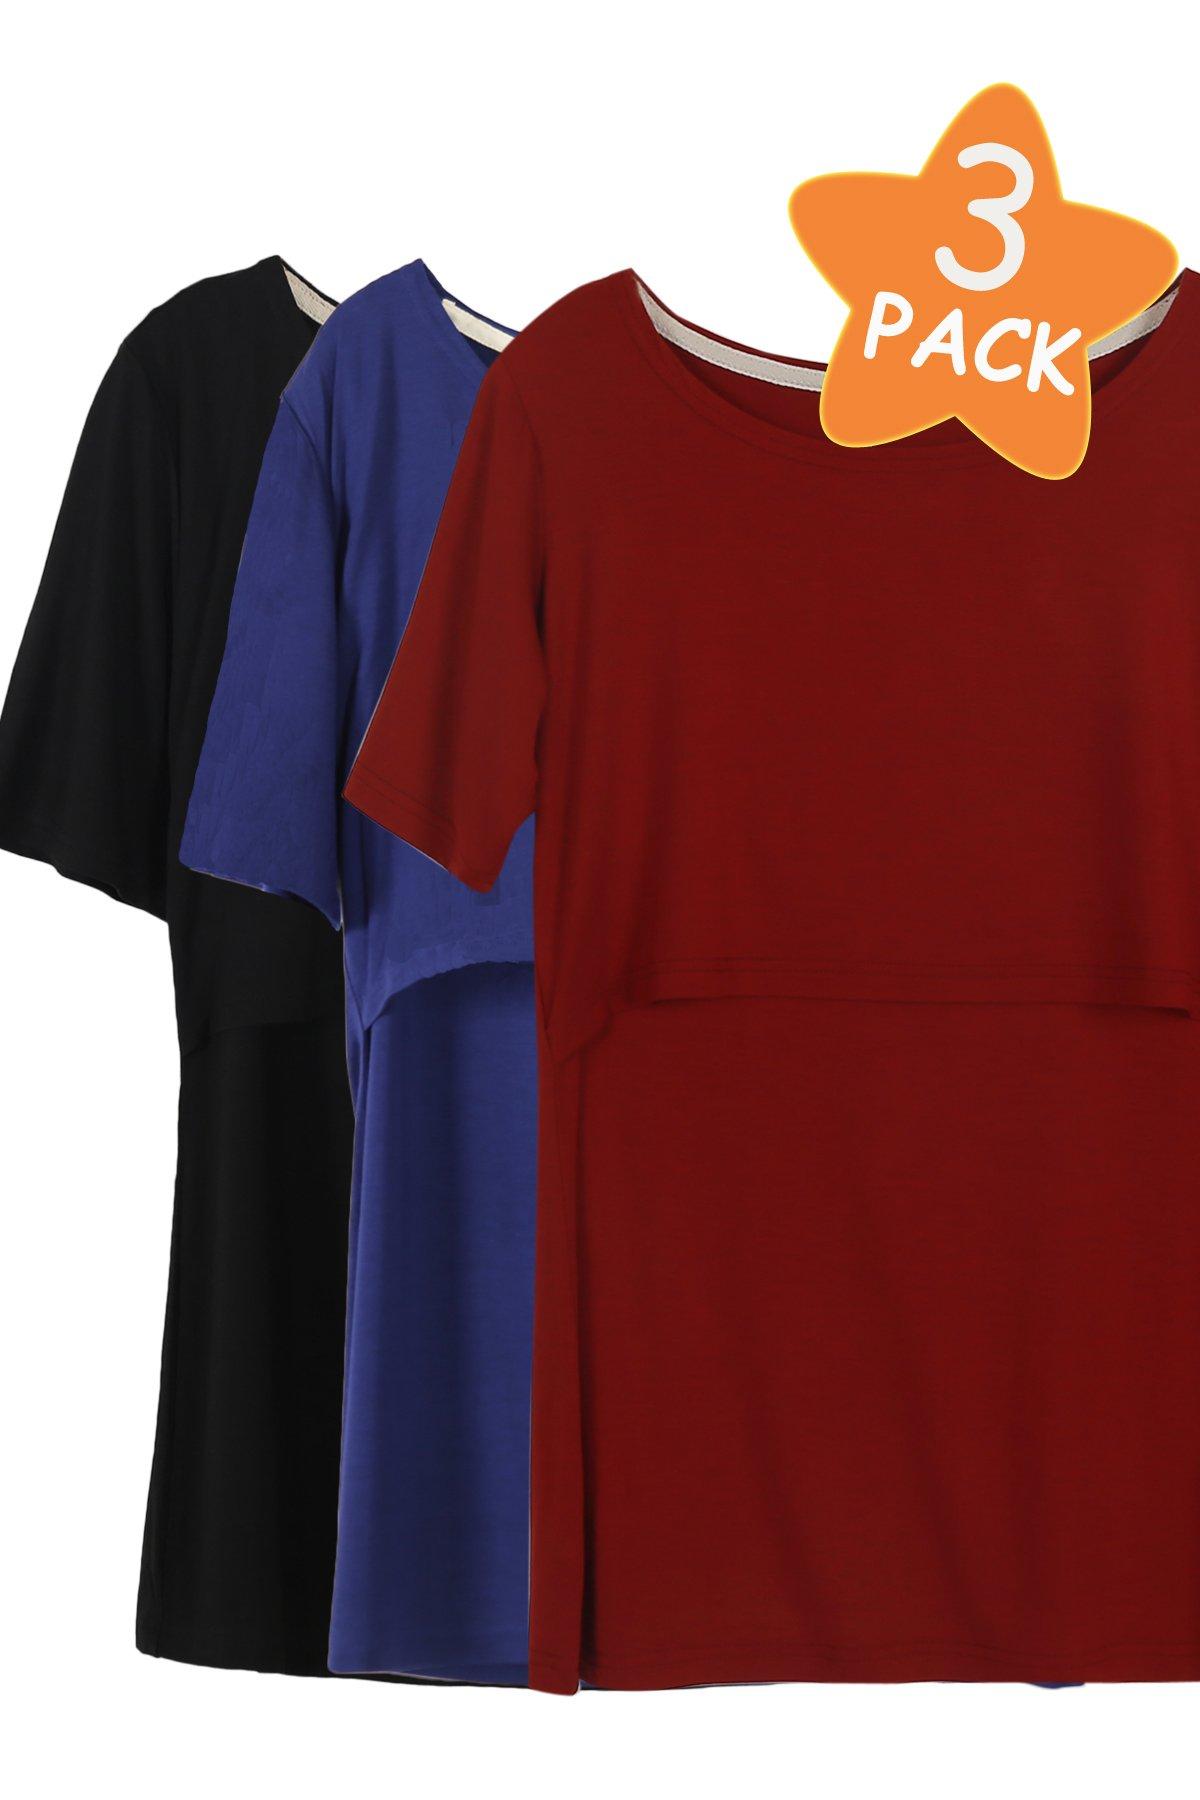 Smallshow 3 Pcs Maternity Nursing T-Shirt Nursing Tops,Navy-Black-Burgundy,Large